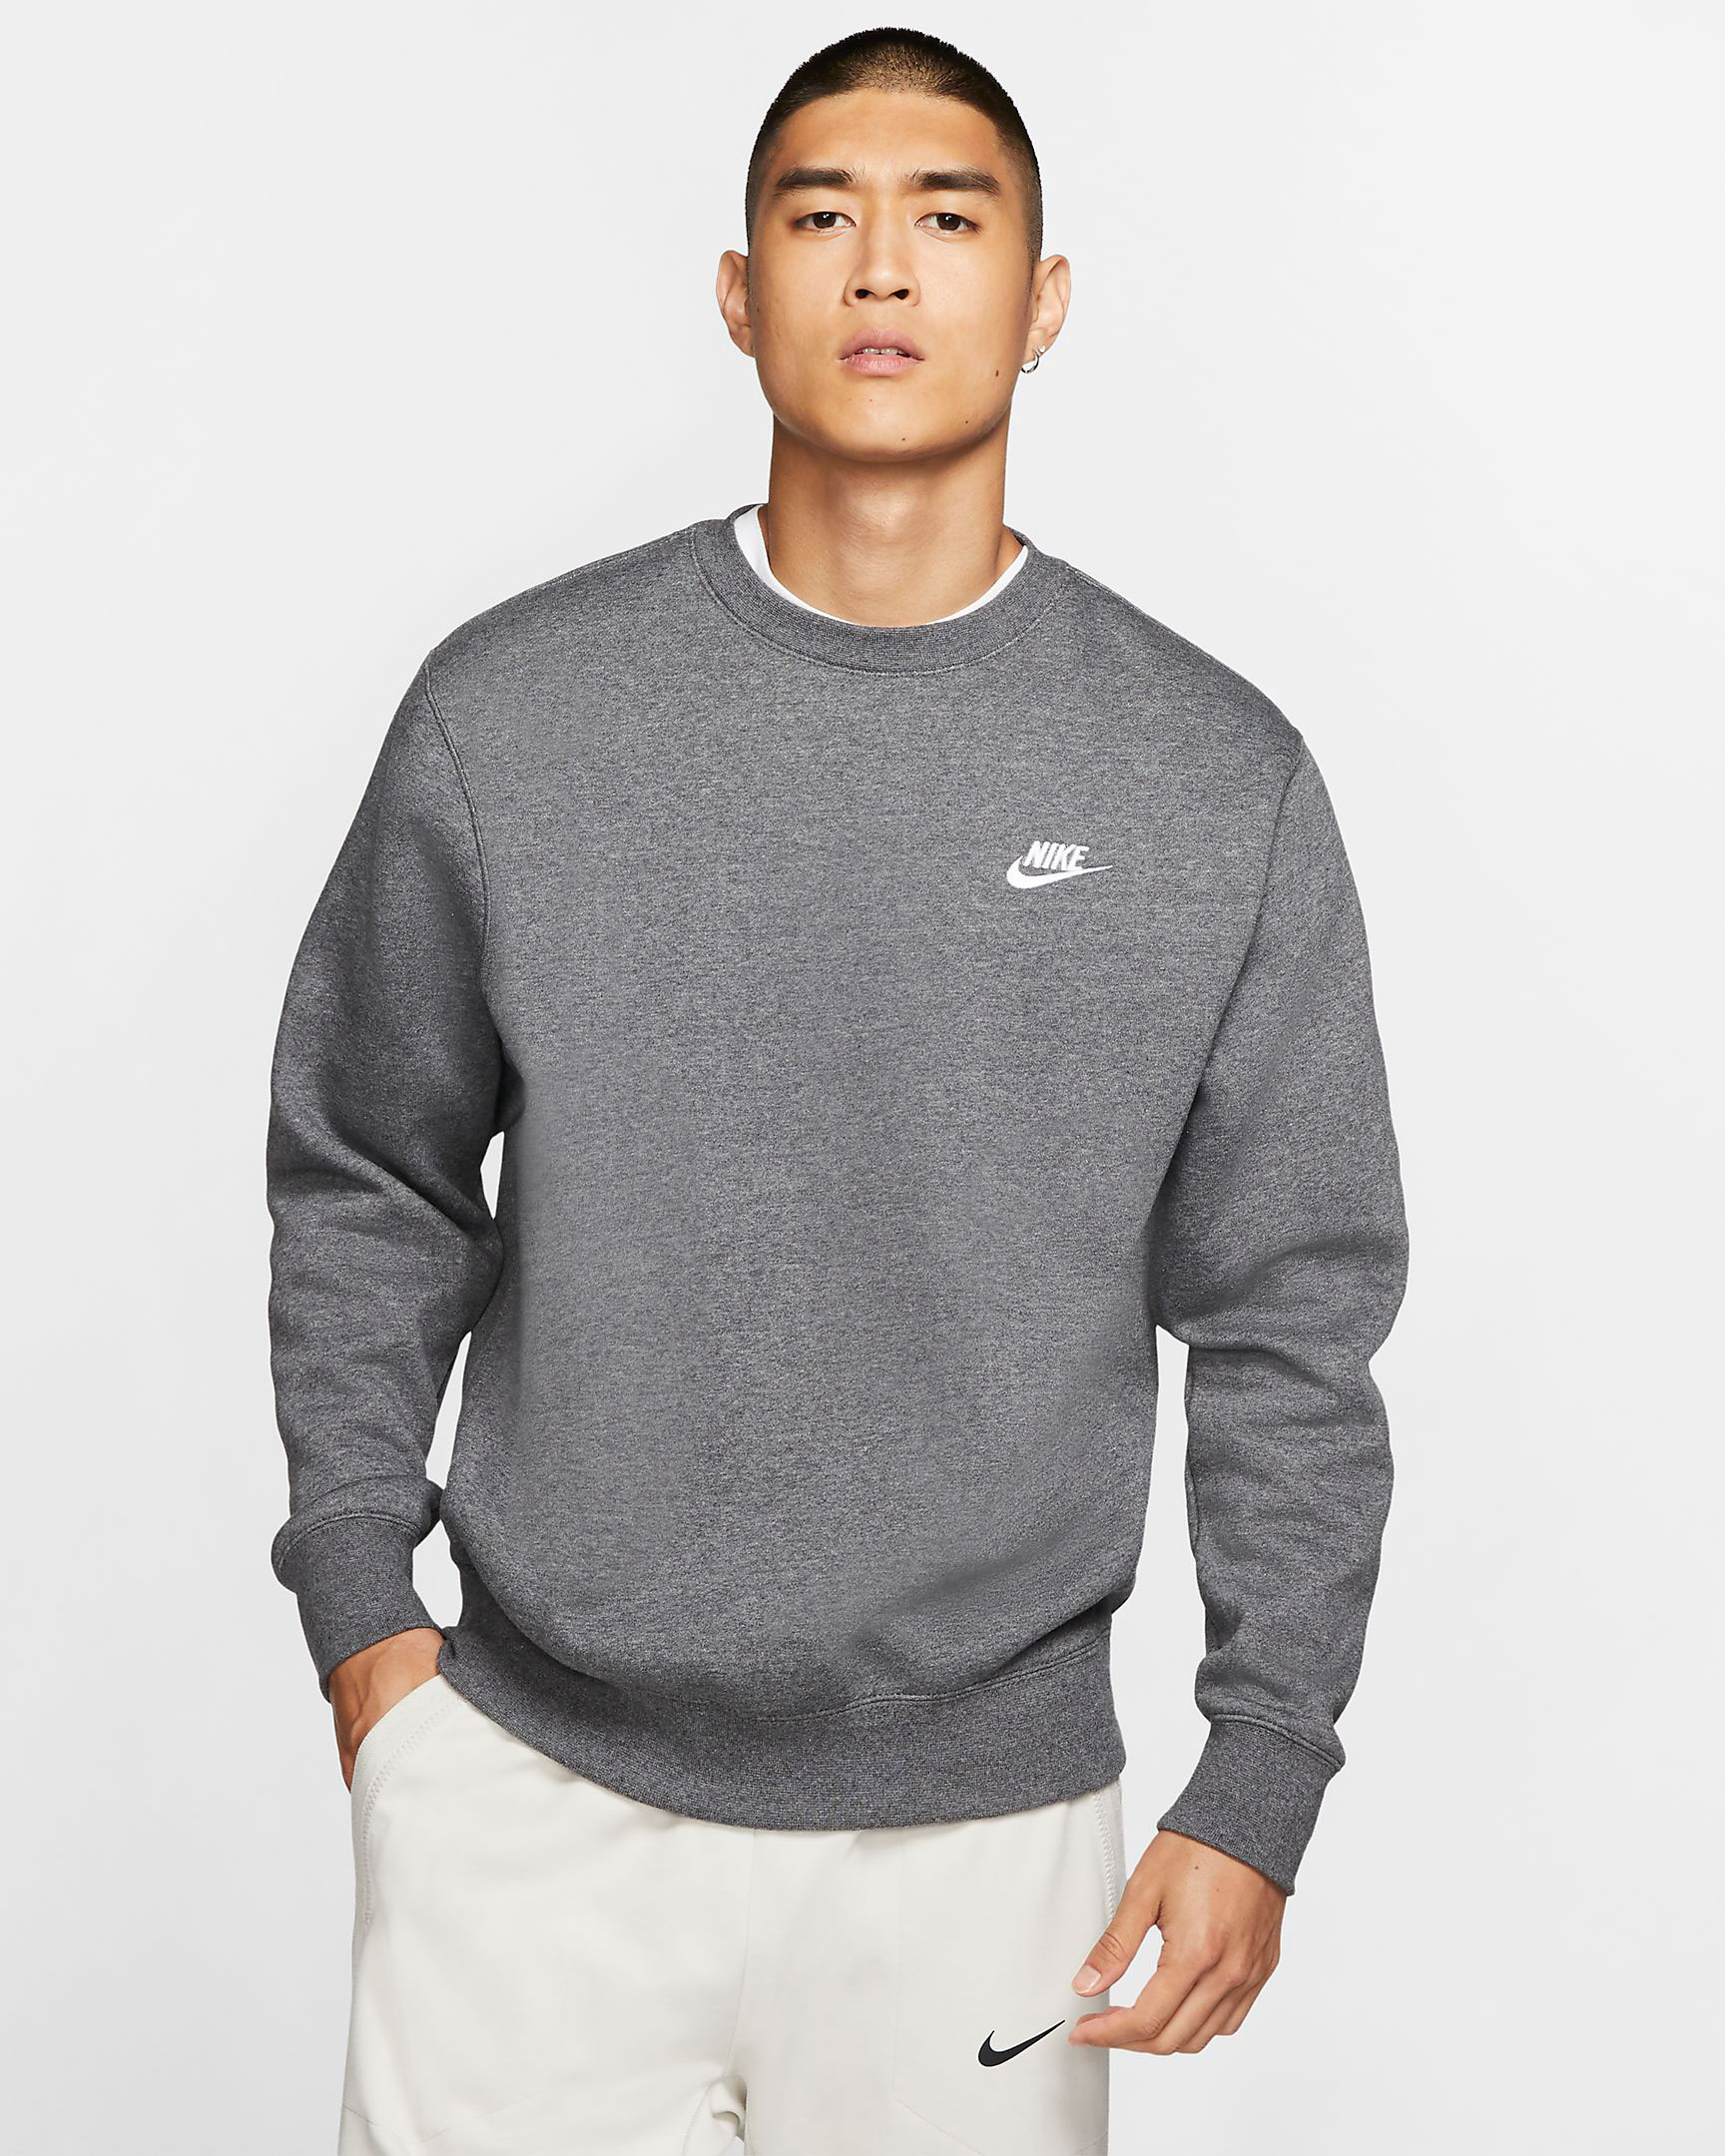 nike-sb-dunk-low-elephant-sweatshirt-2